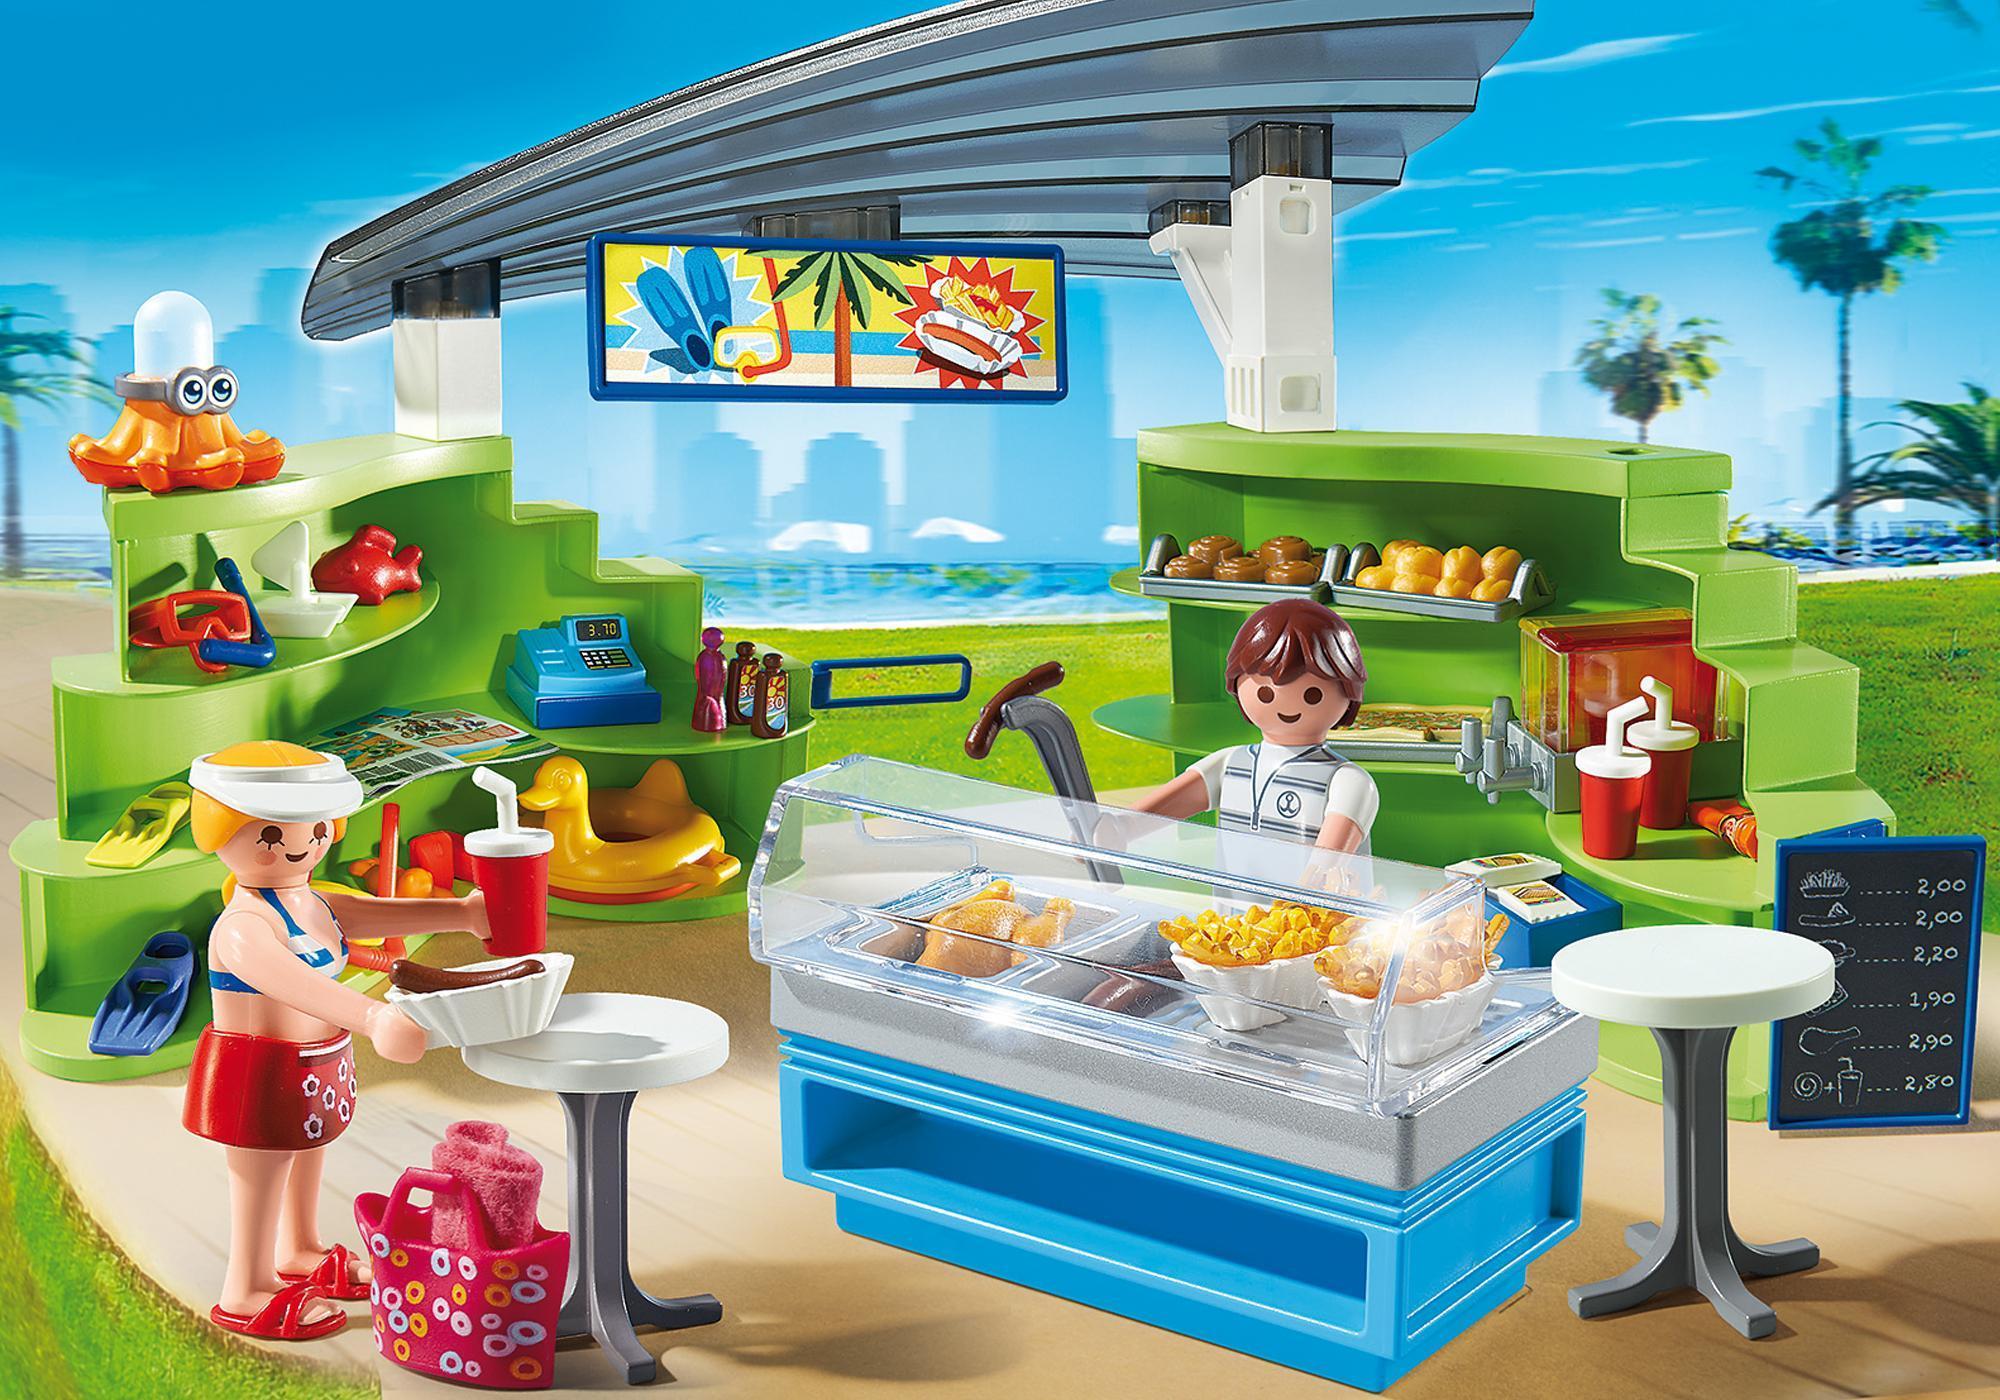 http://media.playmobil.com/i/playmobil/6672_product_detail/Espace boutique et fast-food